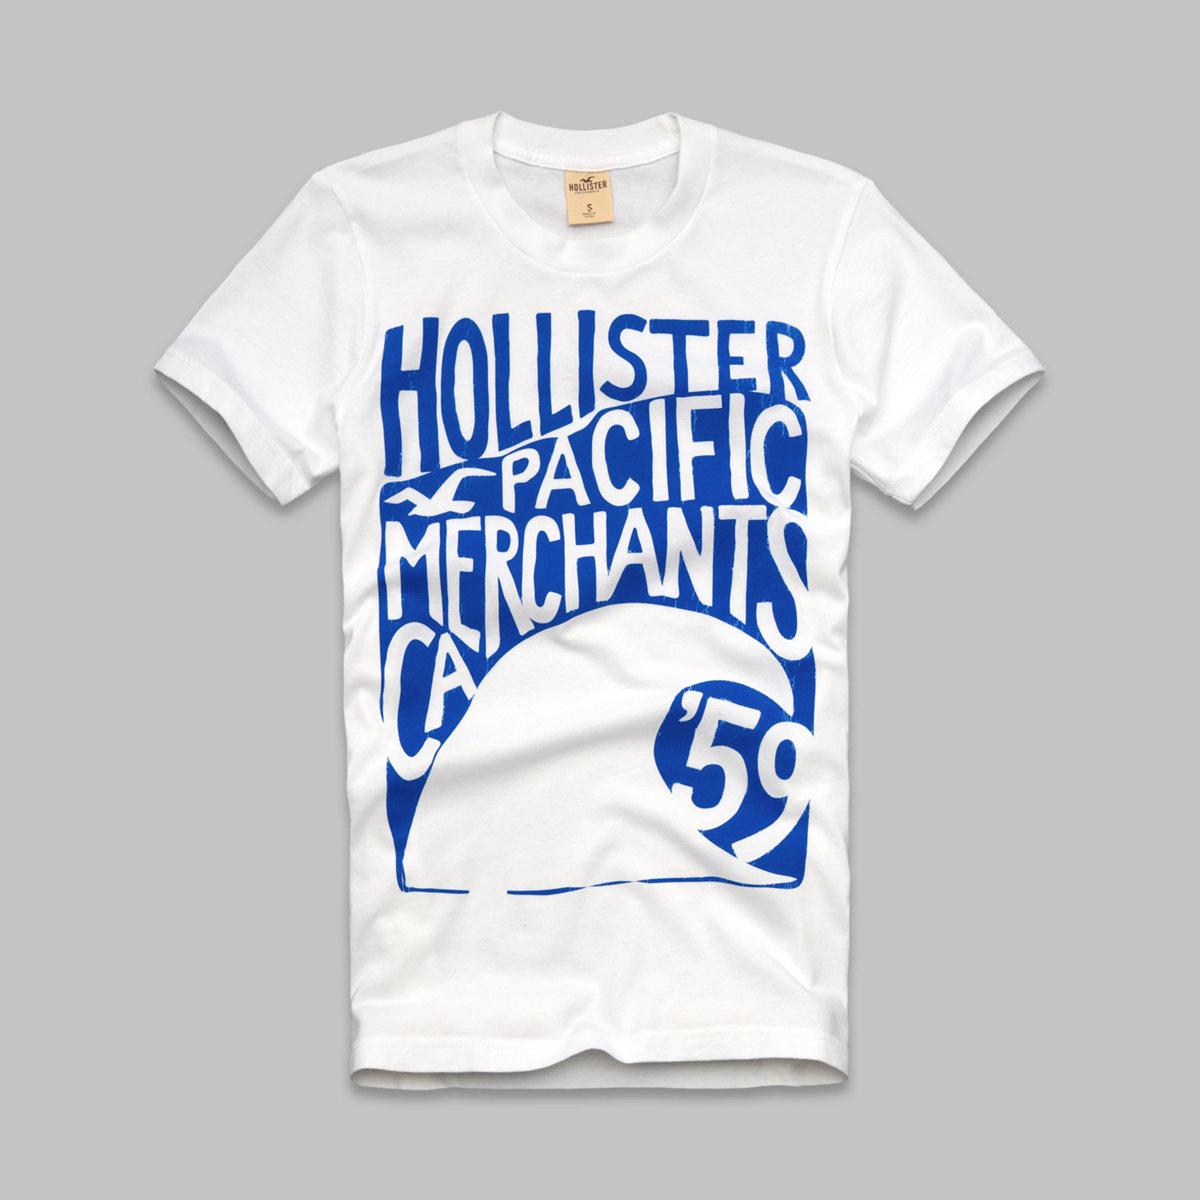 PC Highway T-Shirt